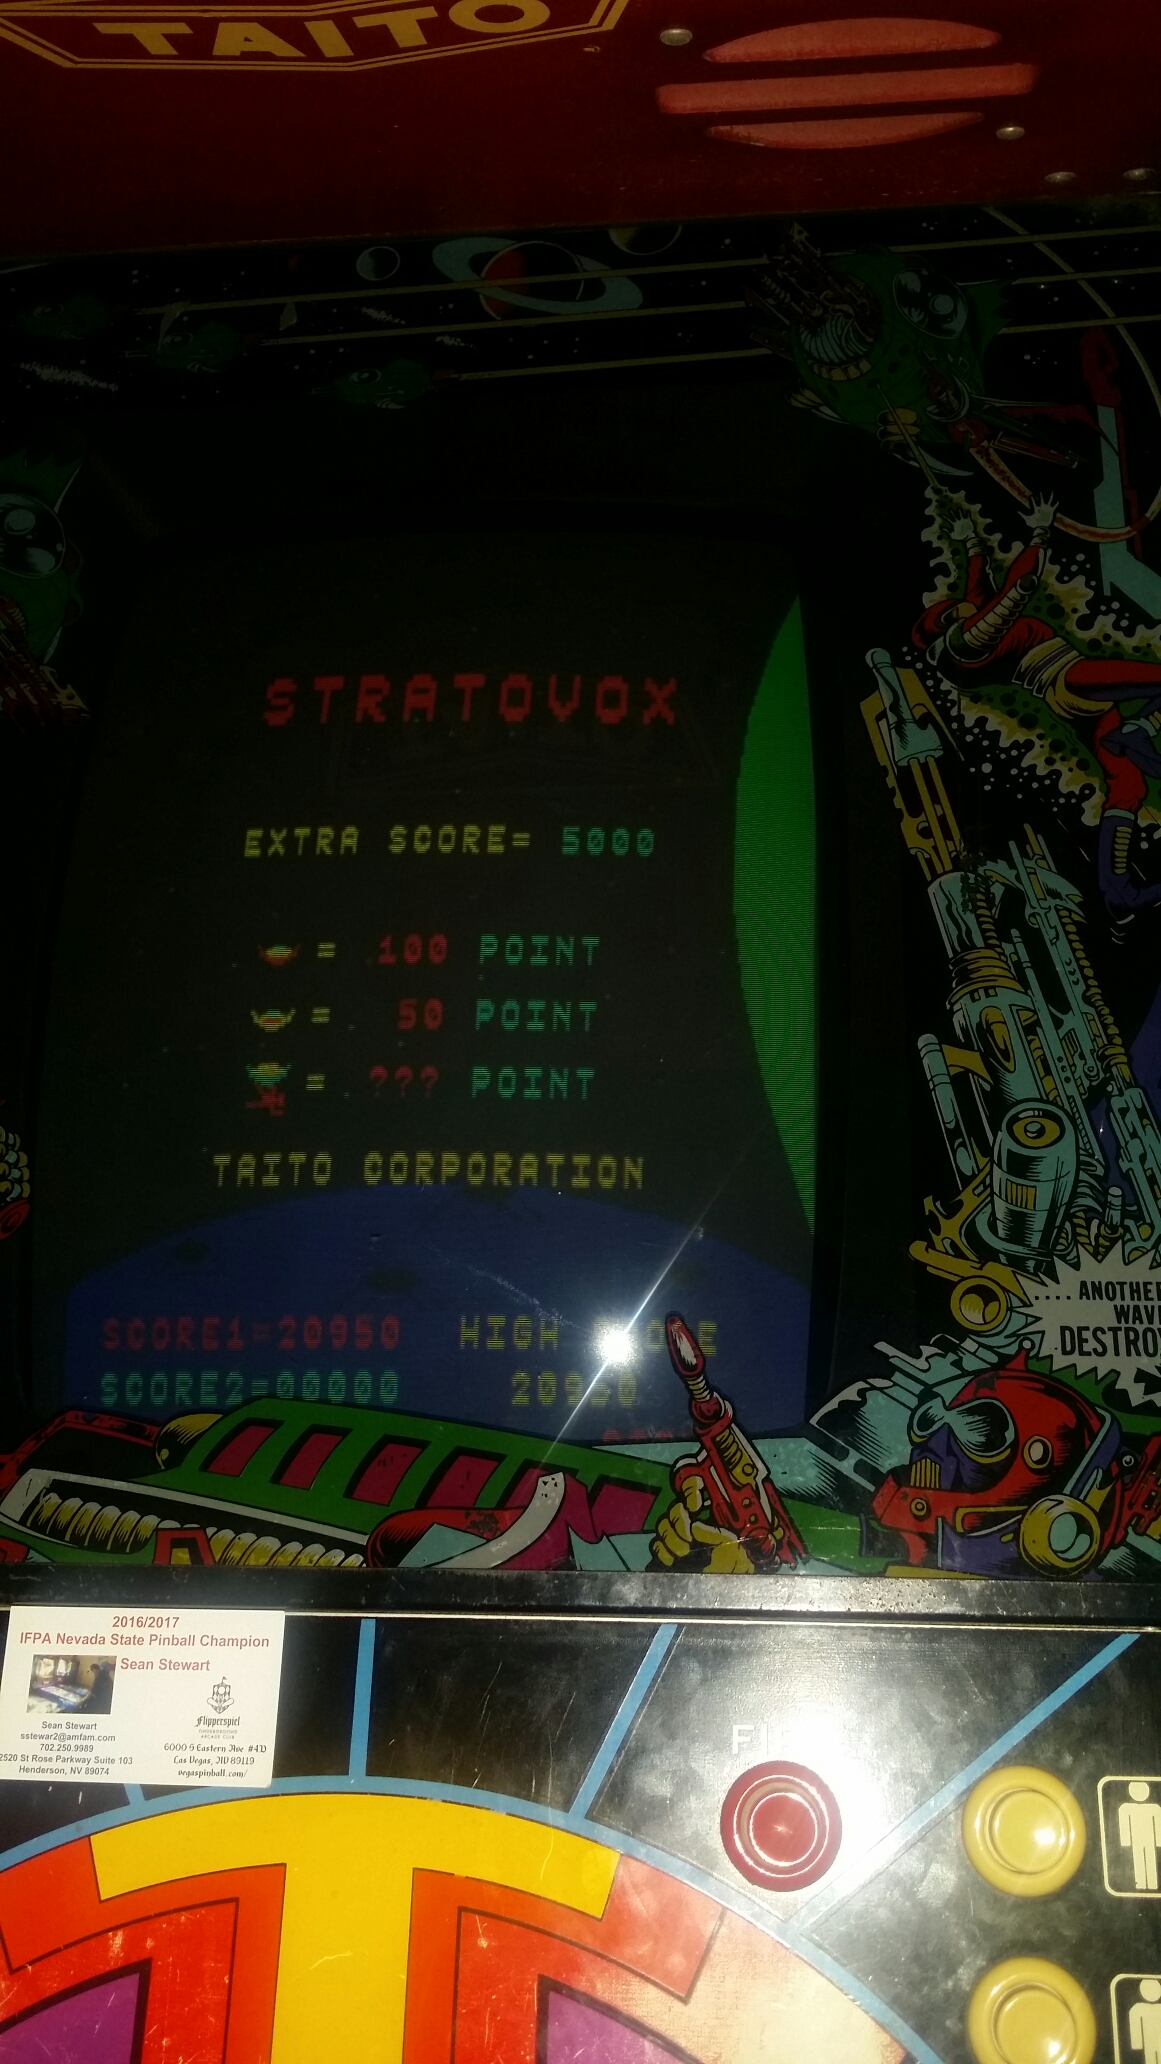 Stratovox 20,950 points